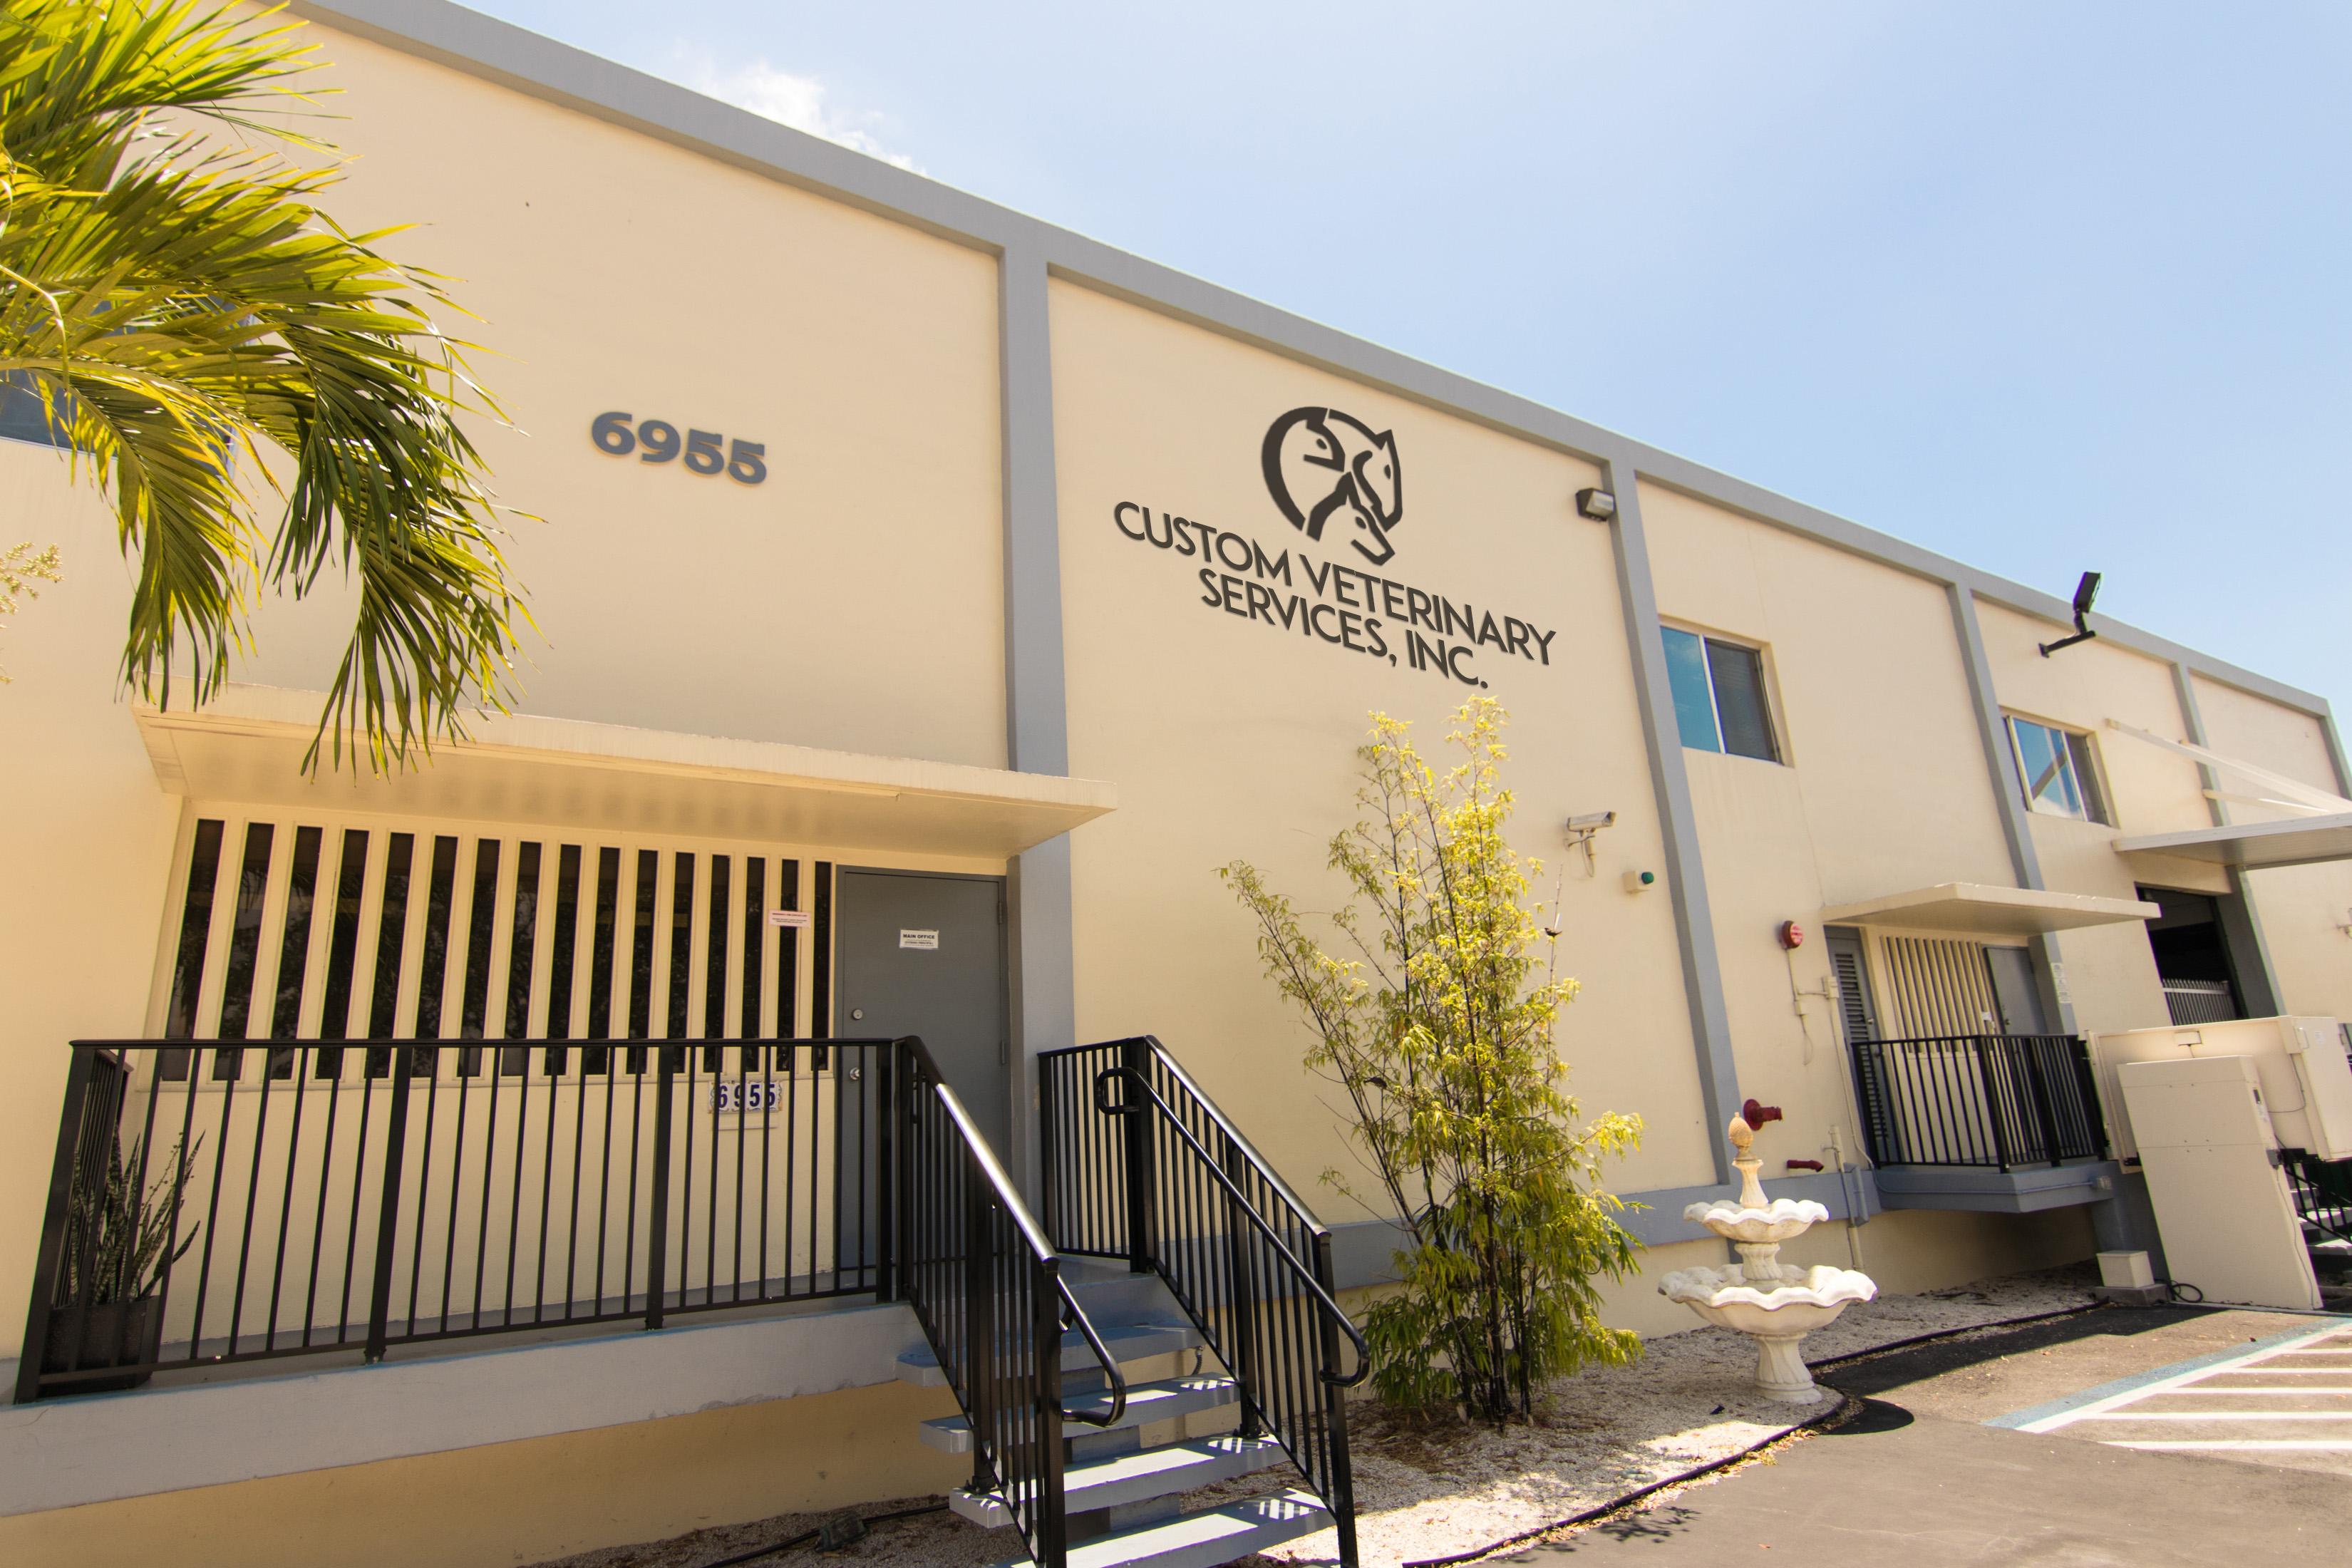 Corporate: Custom Vet Services